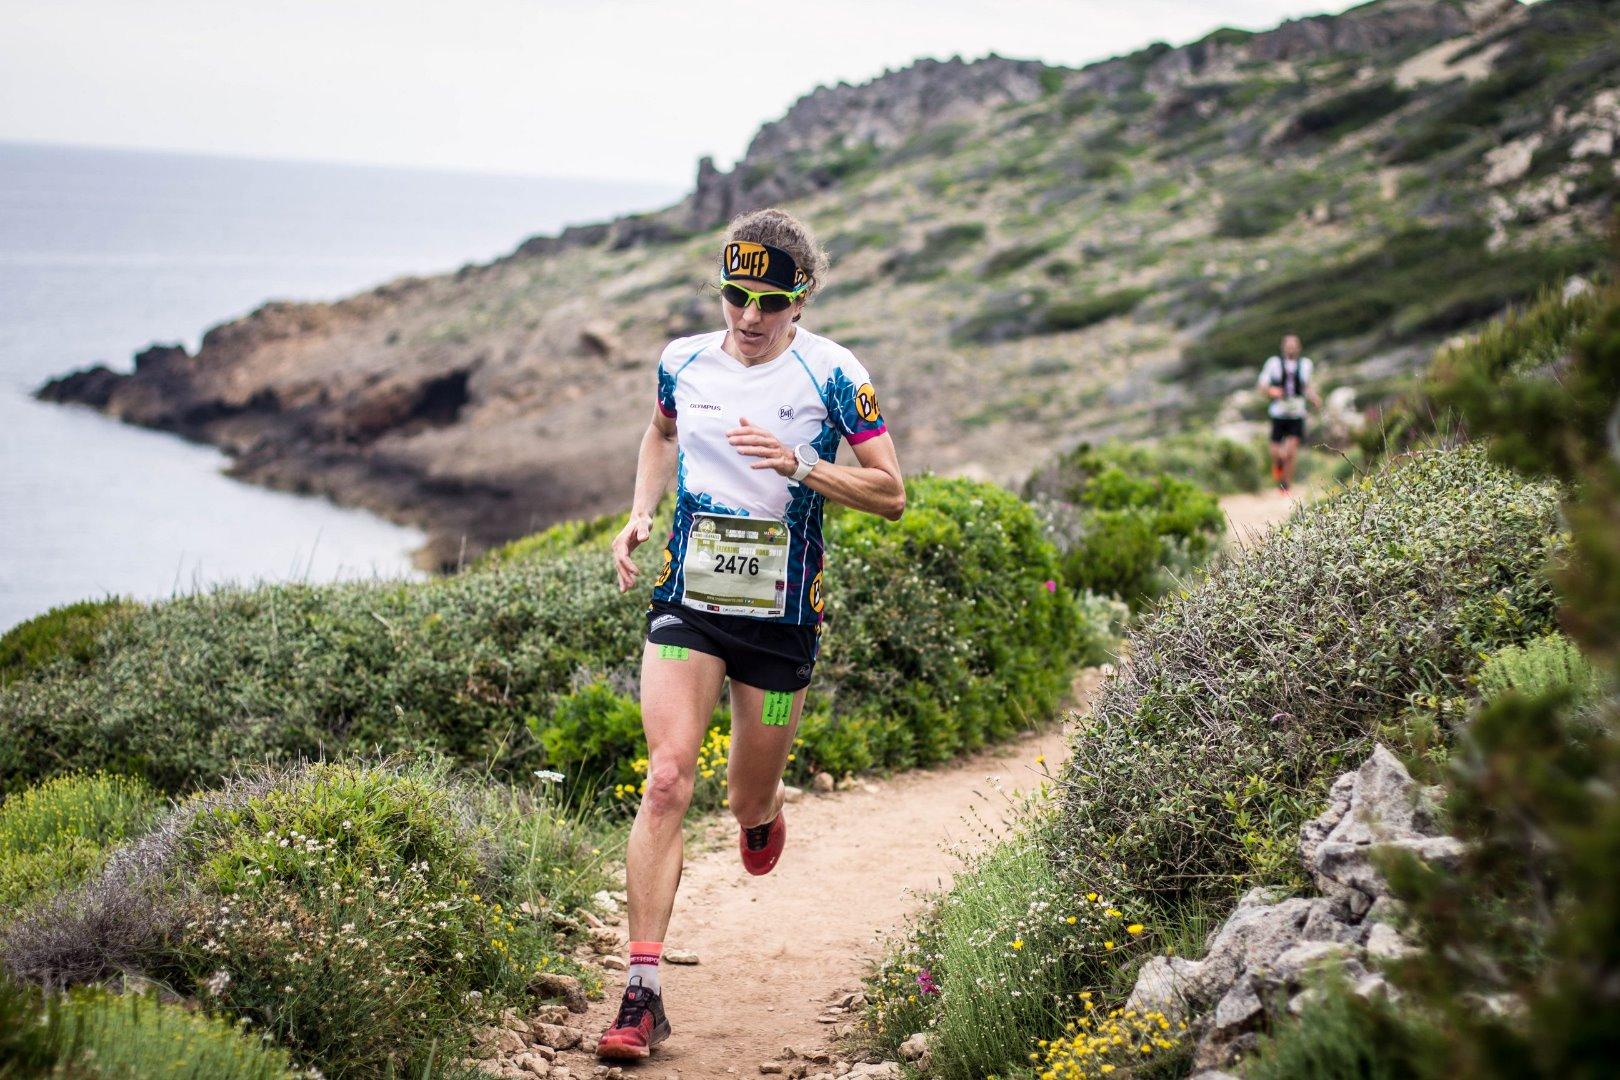 Victoria ex aequo en la Compressport Trail Menorca